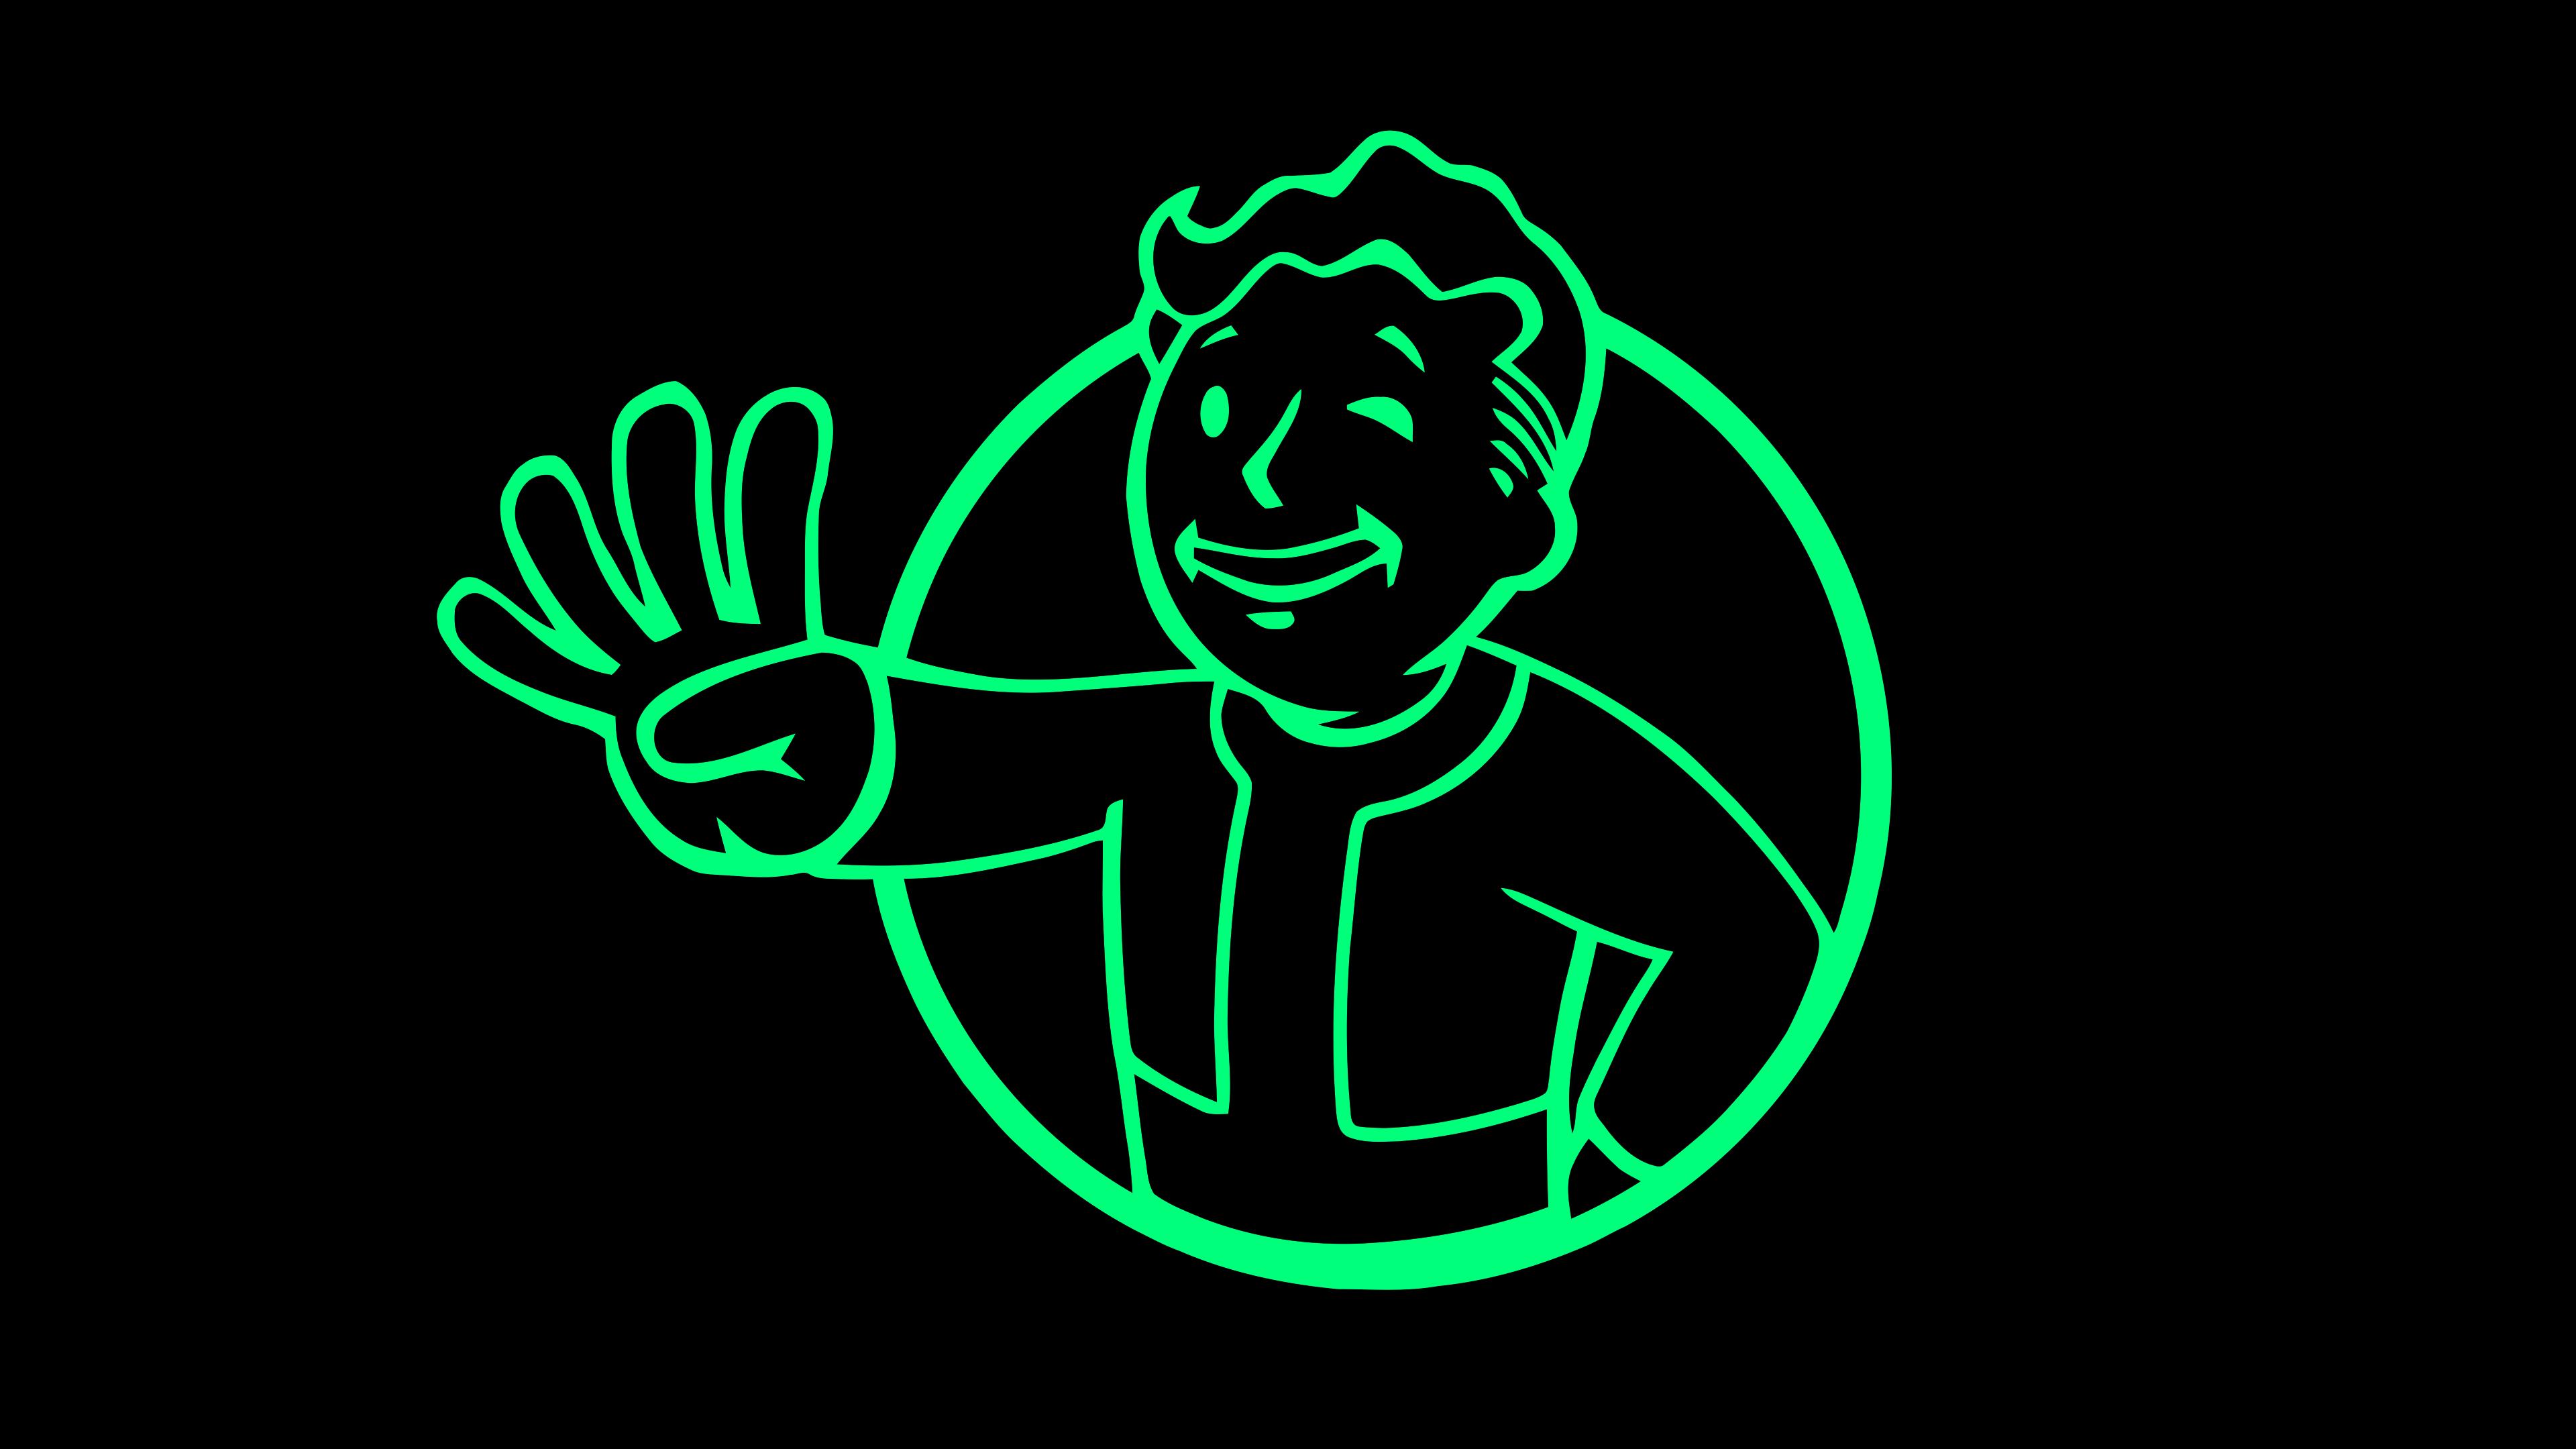 General 3840x2160 Fallout Fallout 4 Vault Boy vector vector art video games green black background black